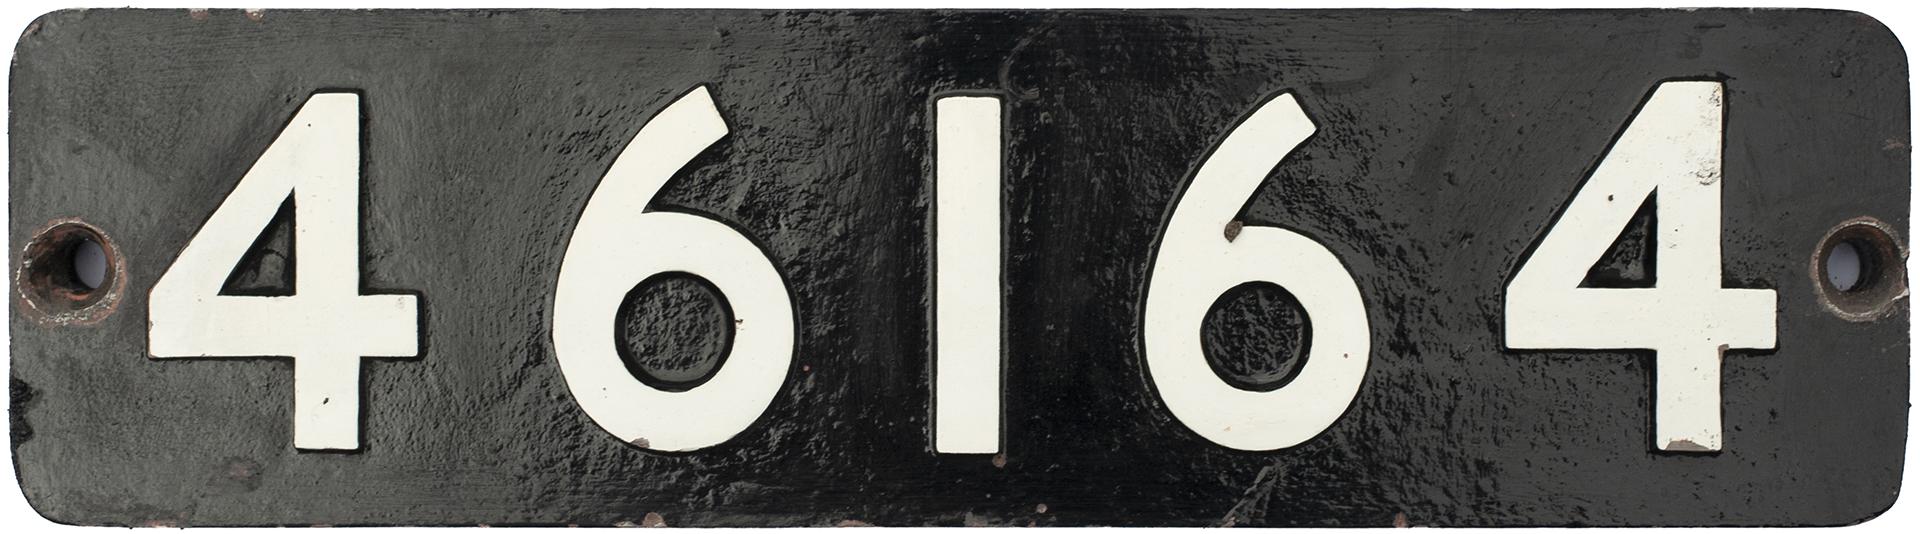 Smokebox Numberplate 46164 Ex LMS Fowler Royal